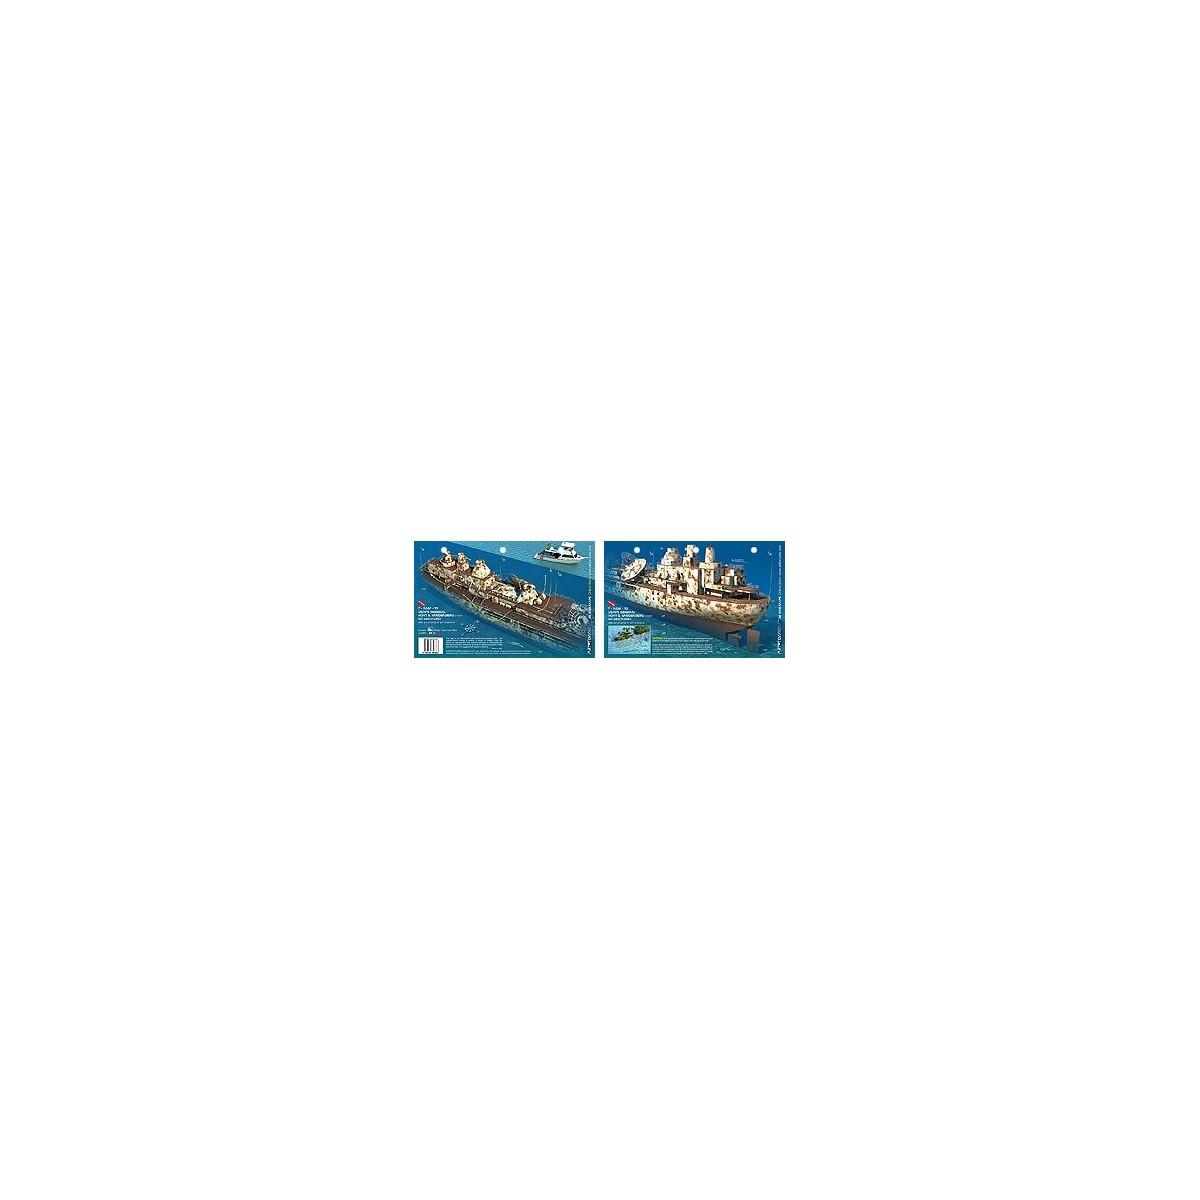 Vandenberg Stern in Key West, Florida (8.5 x 5.5 Inches) (21.6 x 15cm) - New Art to Media Underwater Waterproof 3D Dive Site Map